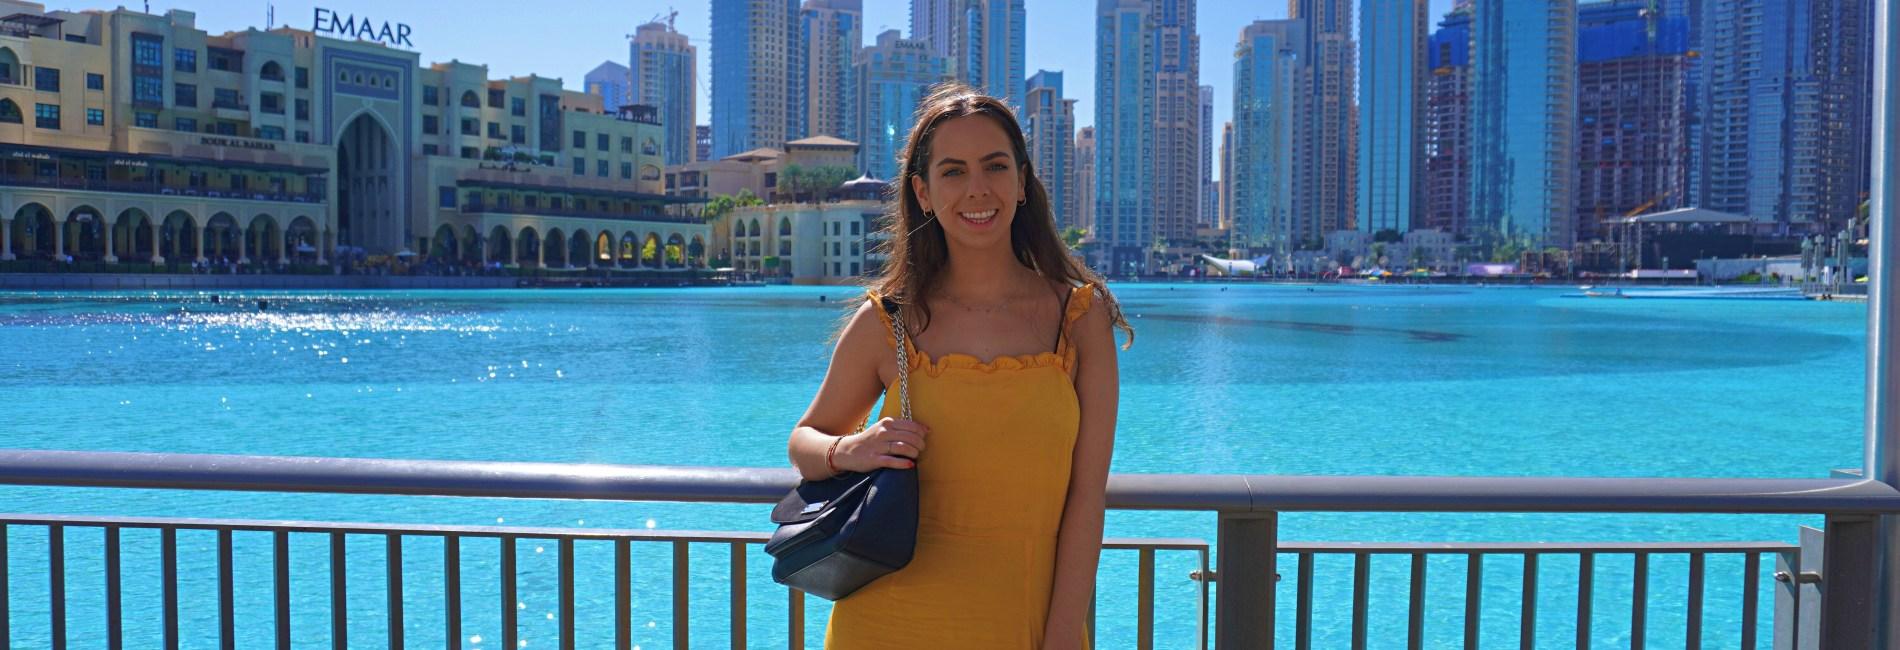 Why I Moved To Dubai